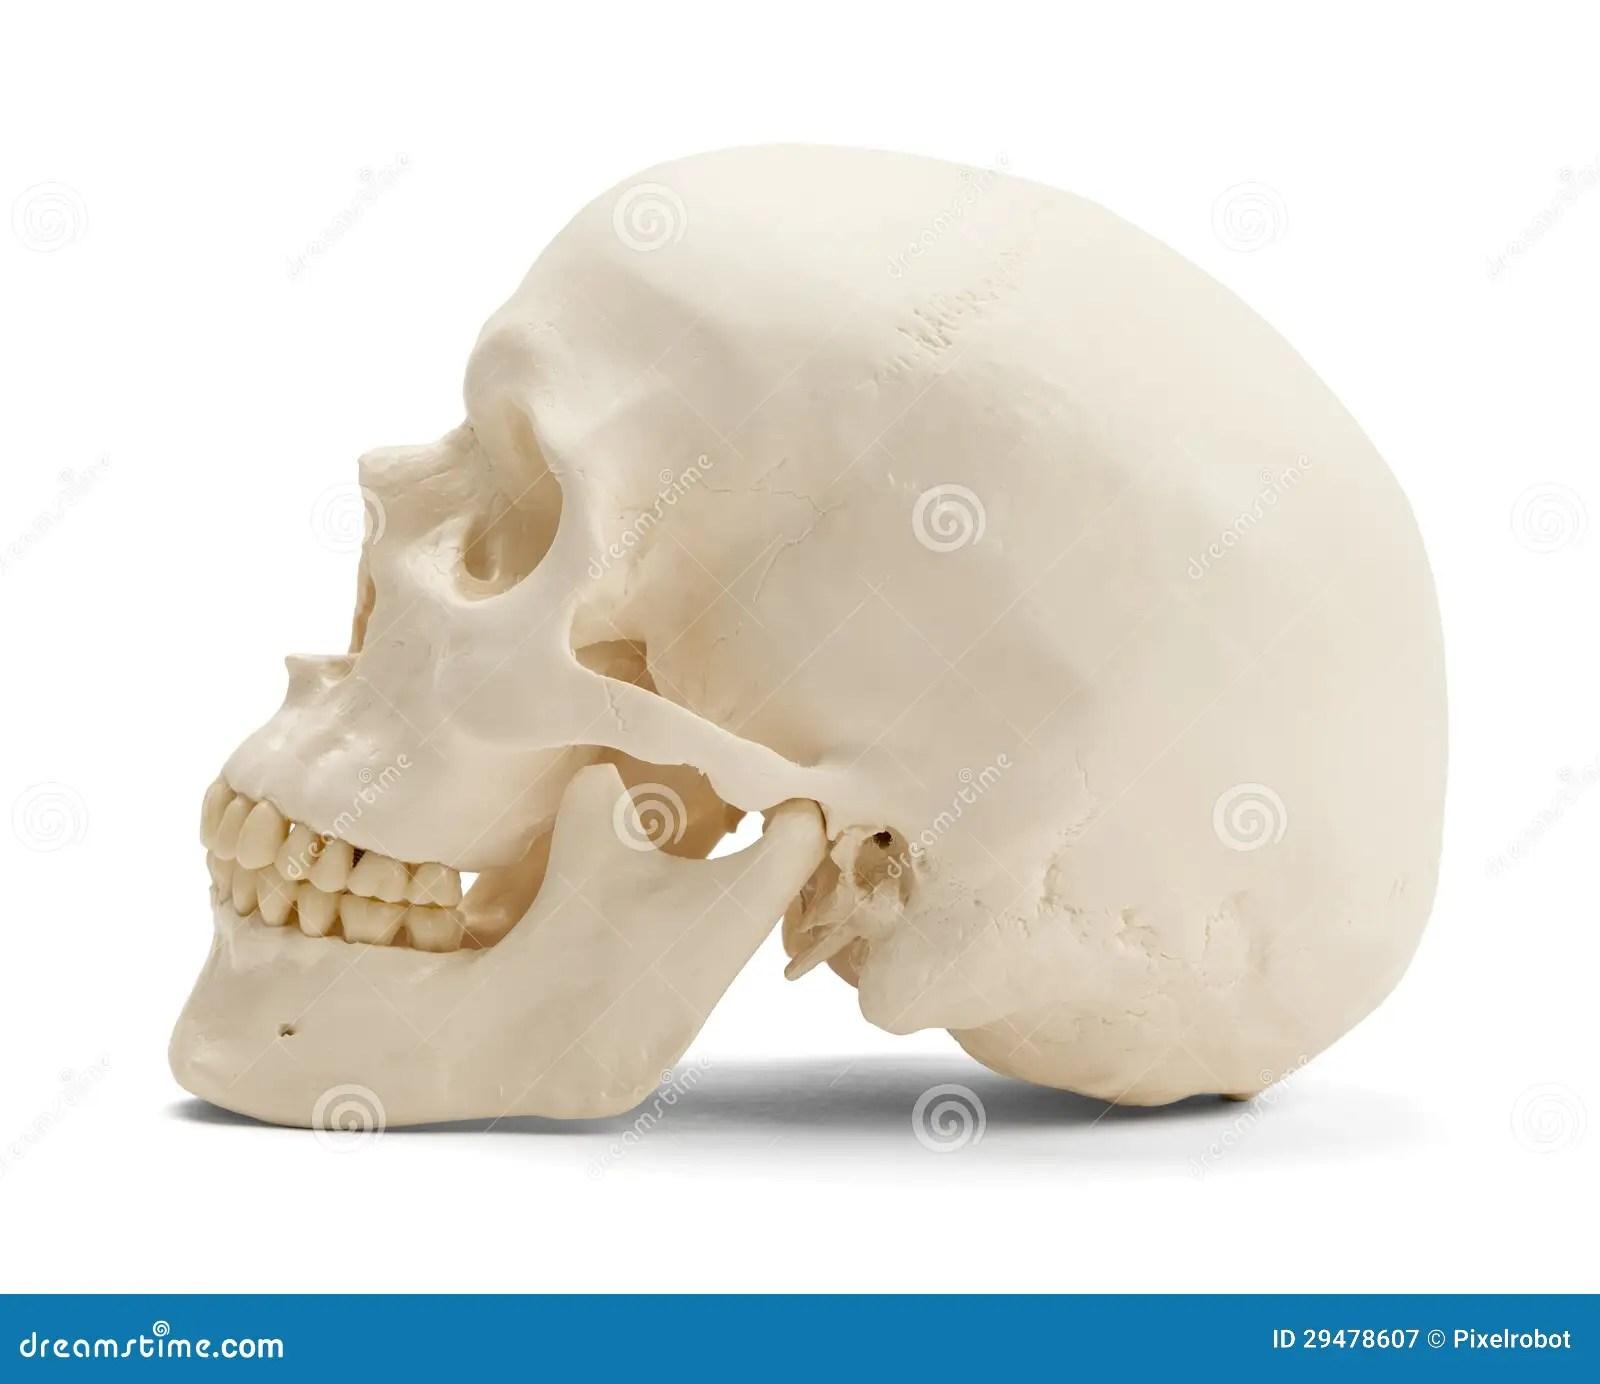 Human Skull Side View Stock Image Image Of Holidays